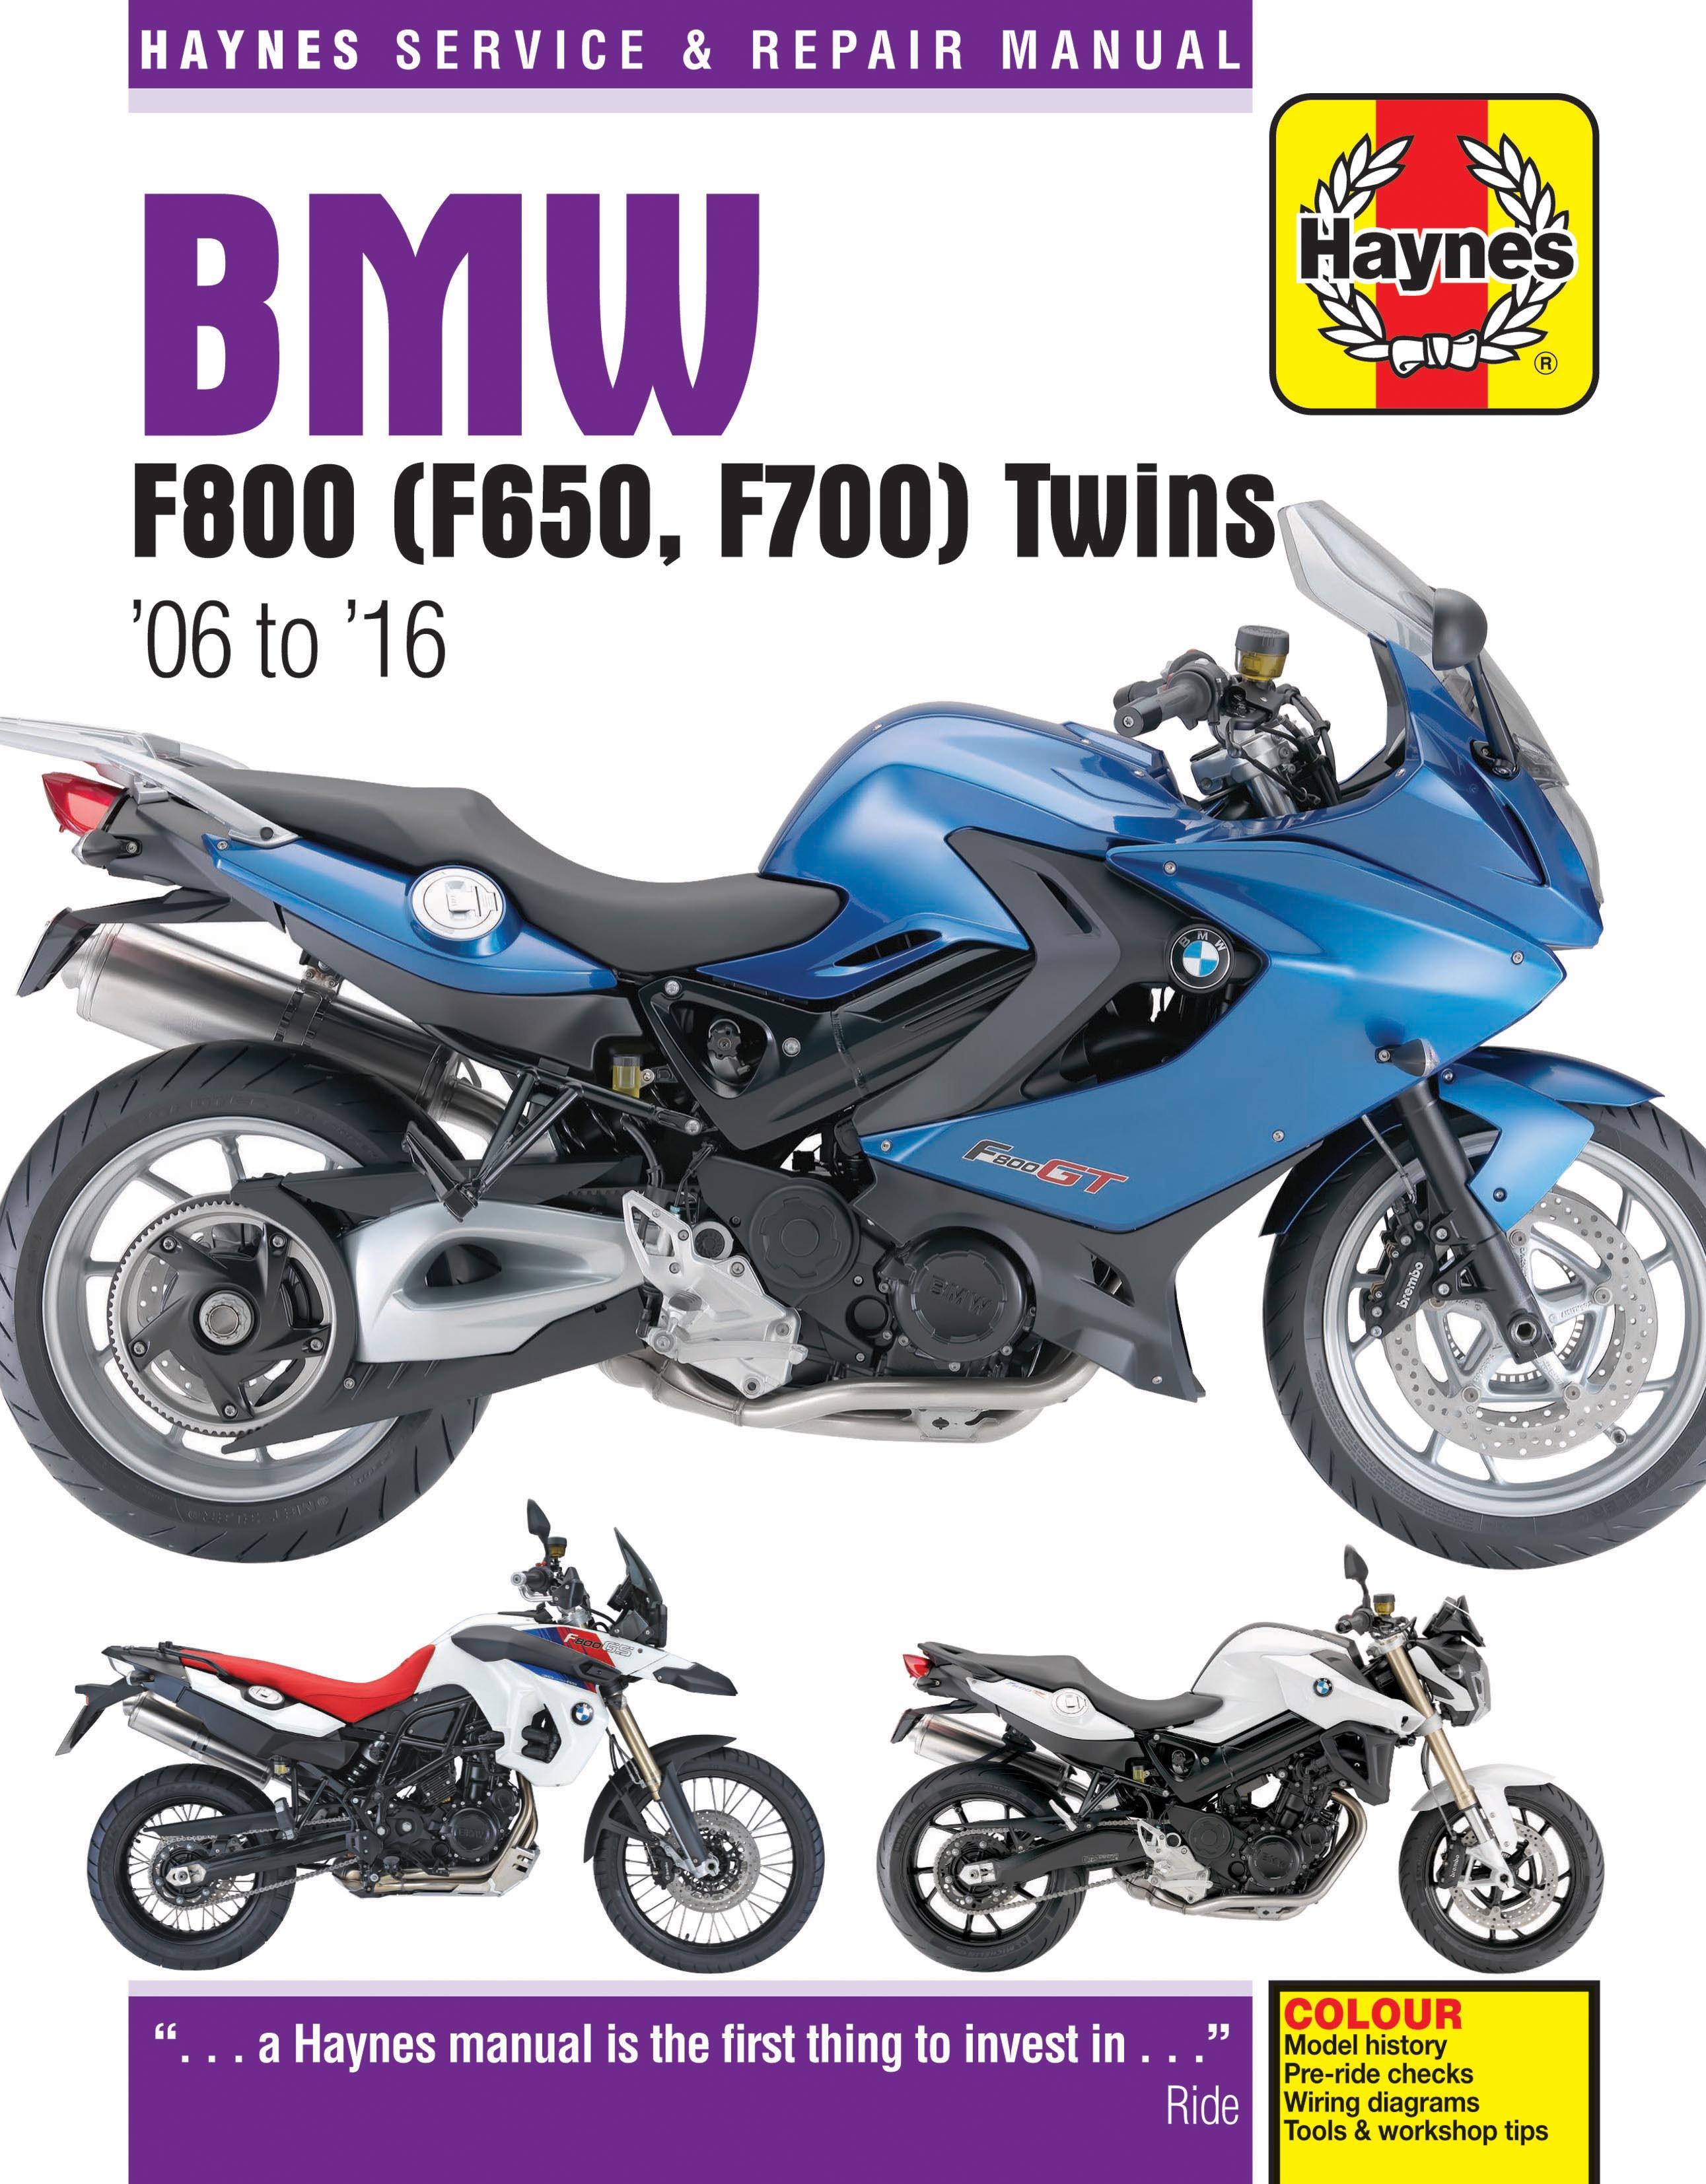 HAYNES Repair Manual - BMW F800 and F650 Twins (2006-2010)-H | Bmw F800gs Motorcycle Wiring Diagram |  | Motorcycle Works